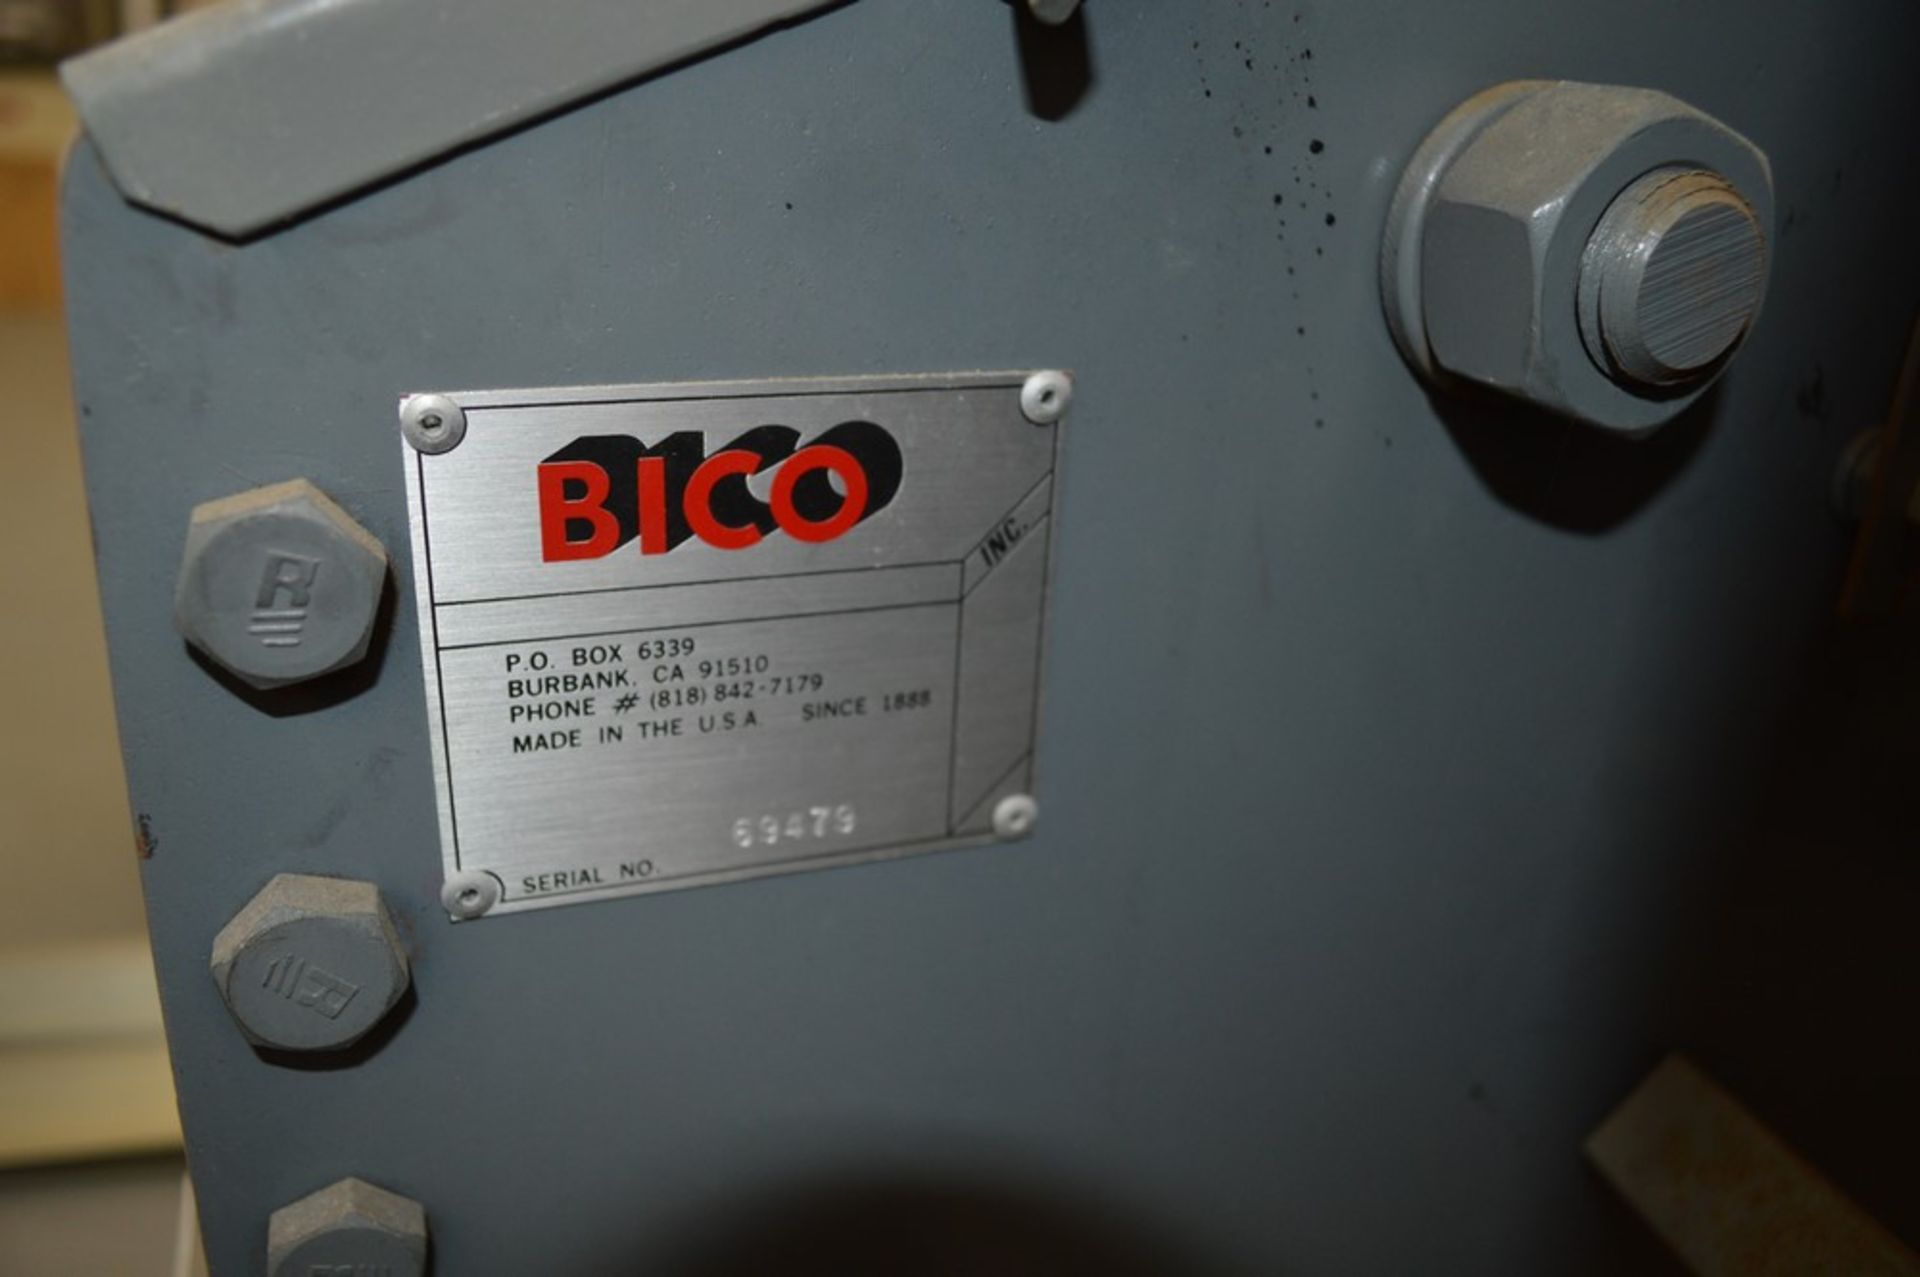 "BICO Rock/Ore Crusher ""Chipmunkcrusher Model 4"", 3 HP, 9"" x 3 1/2"" Opening S/N 69479 - Image 4 of 8"